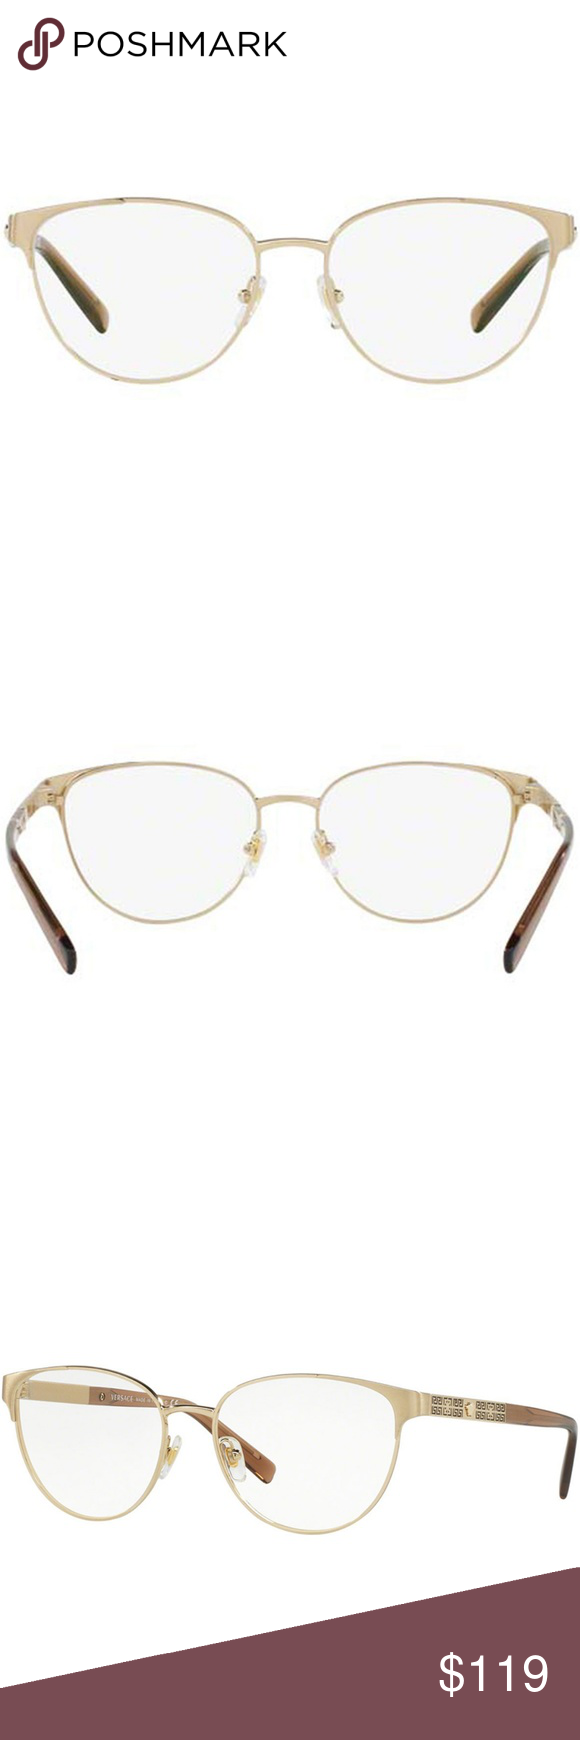 5c90848d7b Versace Square Metal Eyeglasses Frame Silver Gold Brand  Versace Model   VE1238-1339